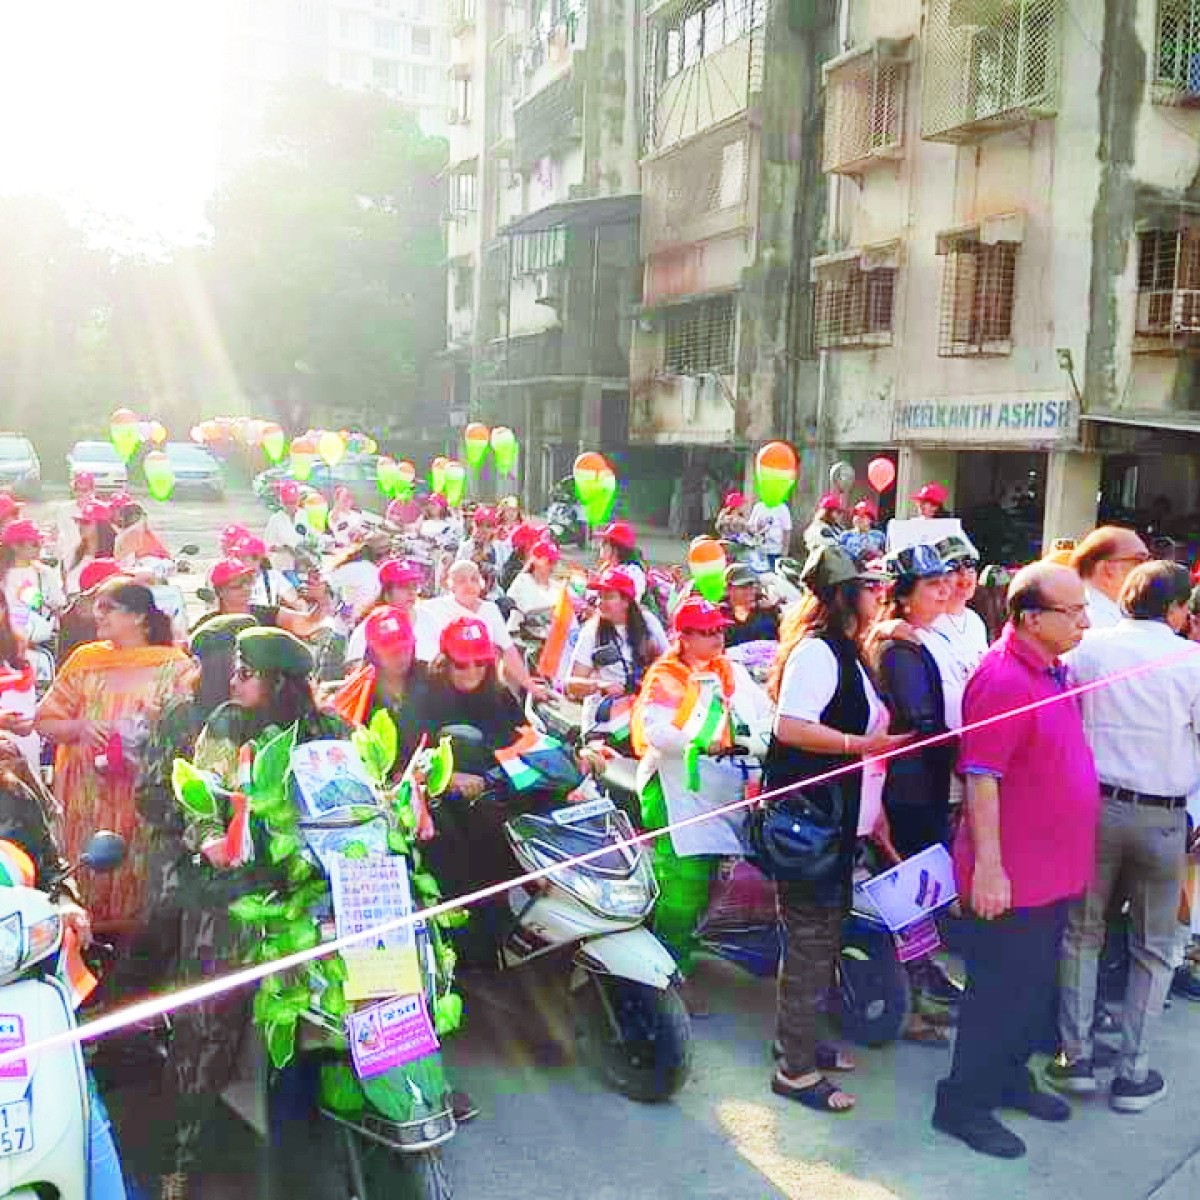 Mumbaiya Gujarati: Women's bike rally in Mulund on March 8